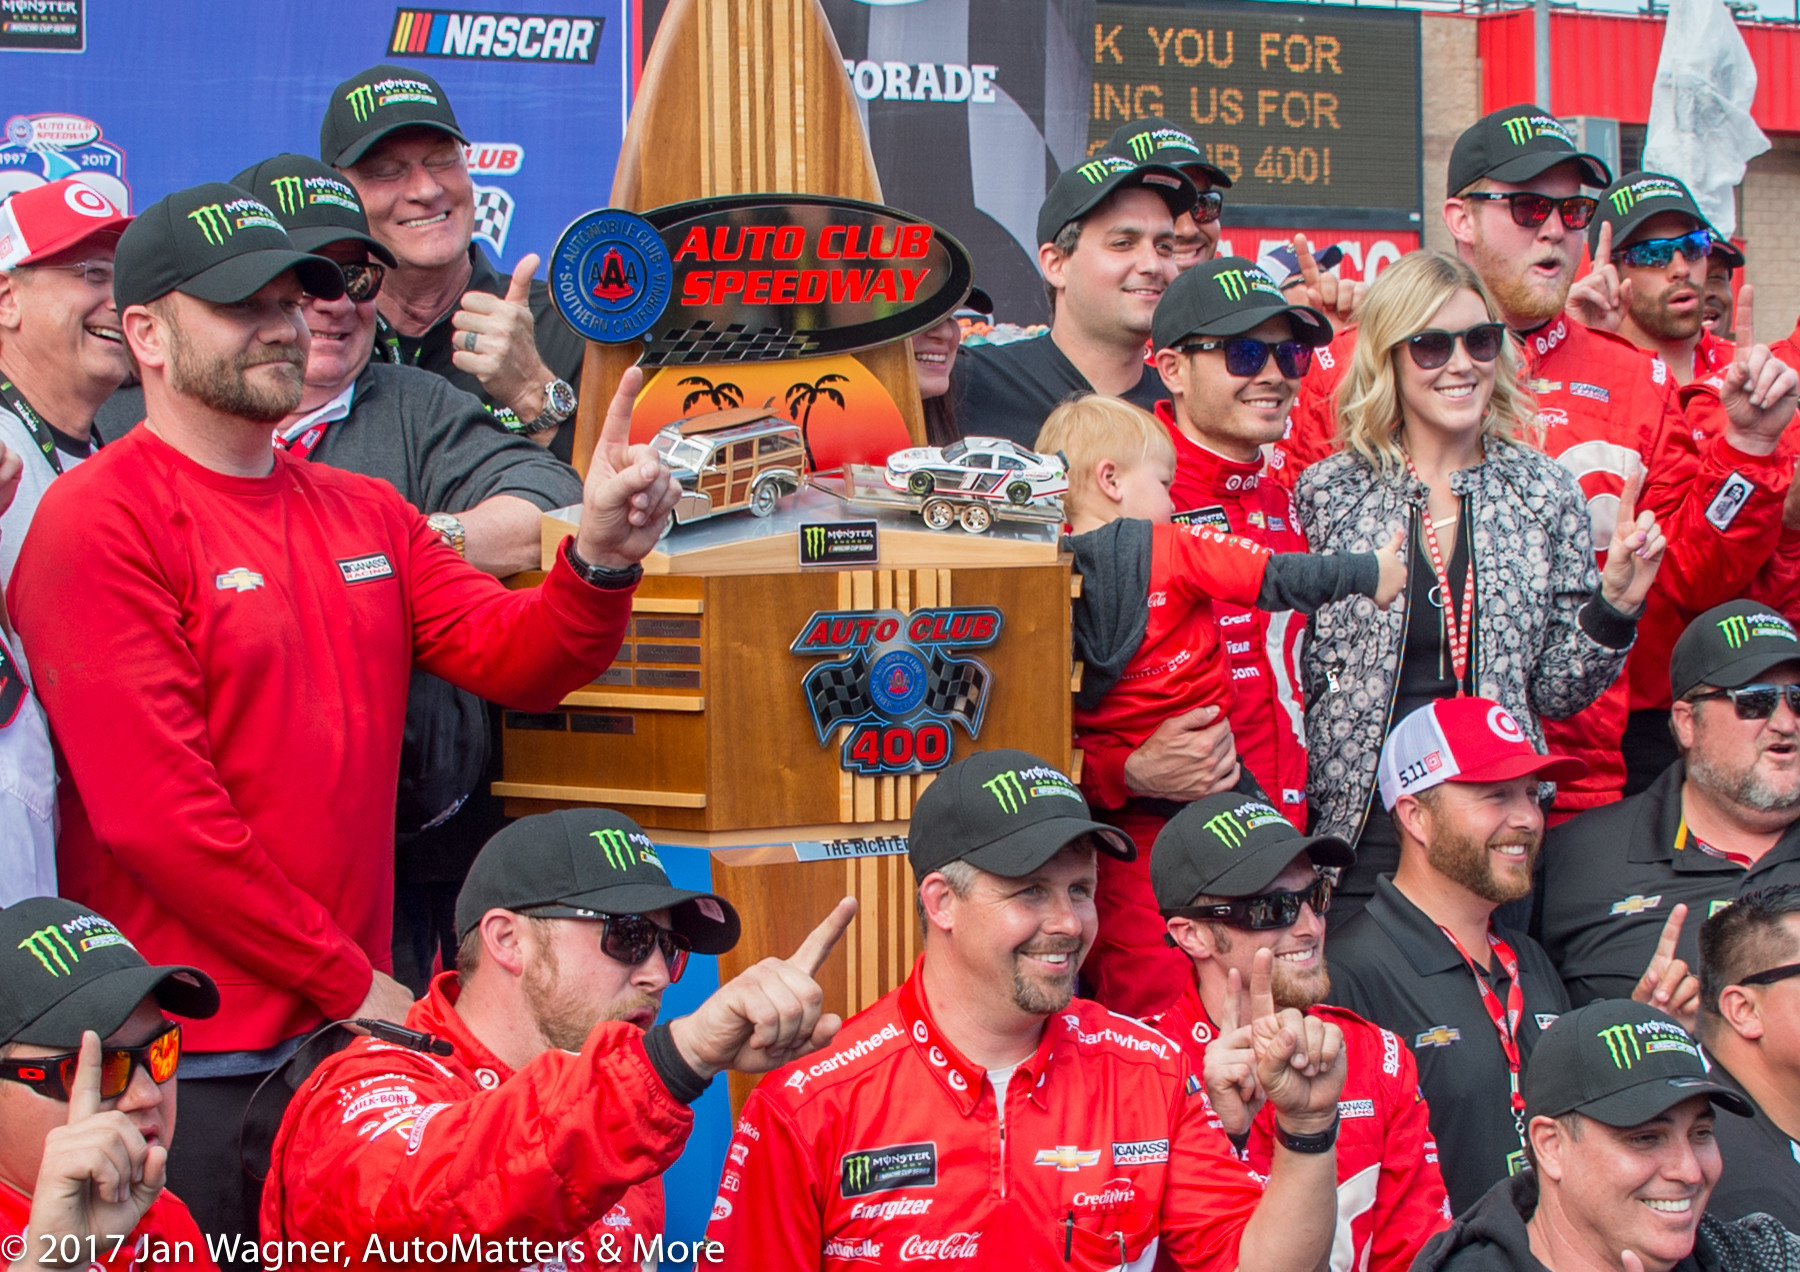 Kyle Larson celebrating Auto Club 400 victory